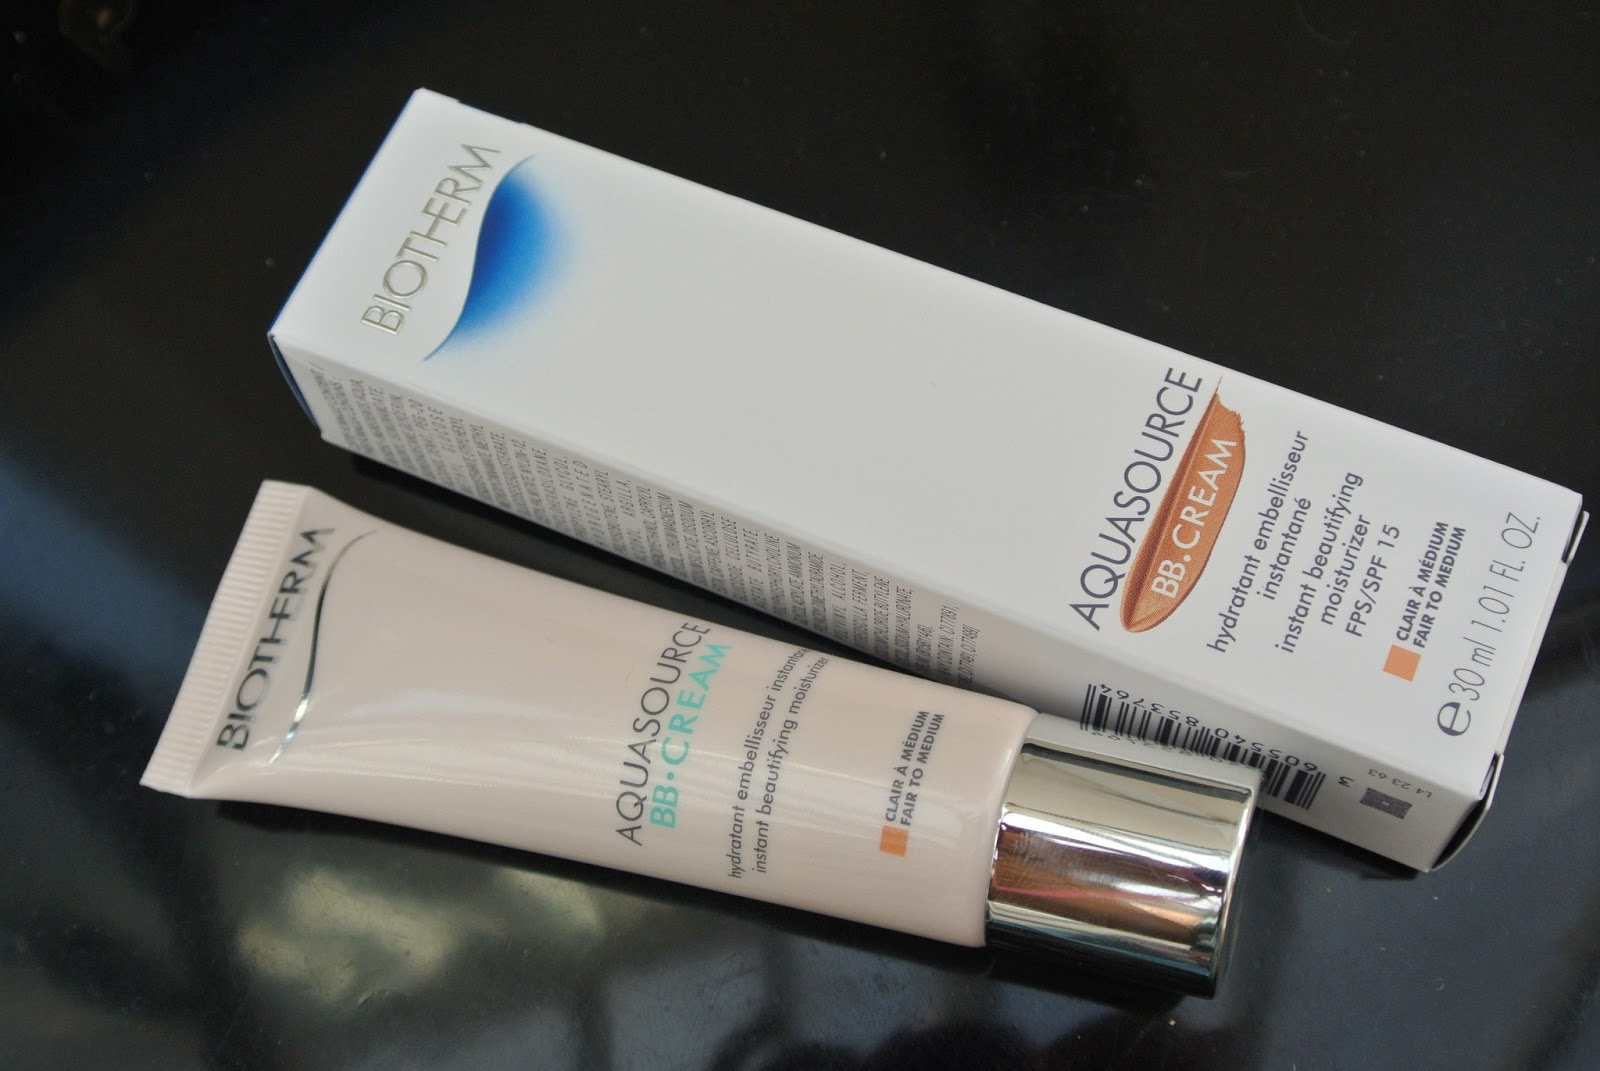 Aquasource BB Cream by Biotherm #7